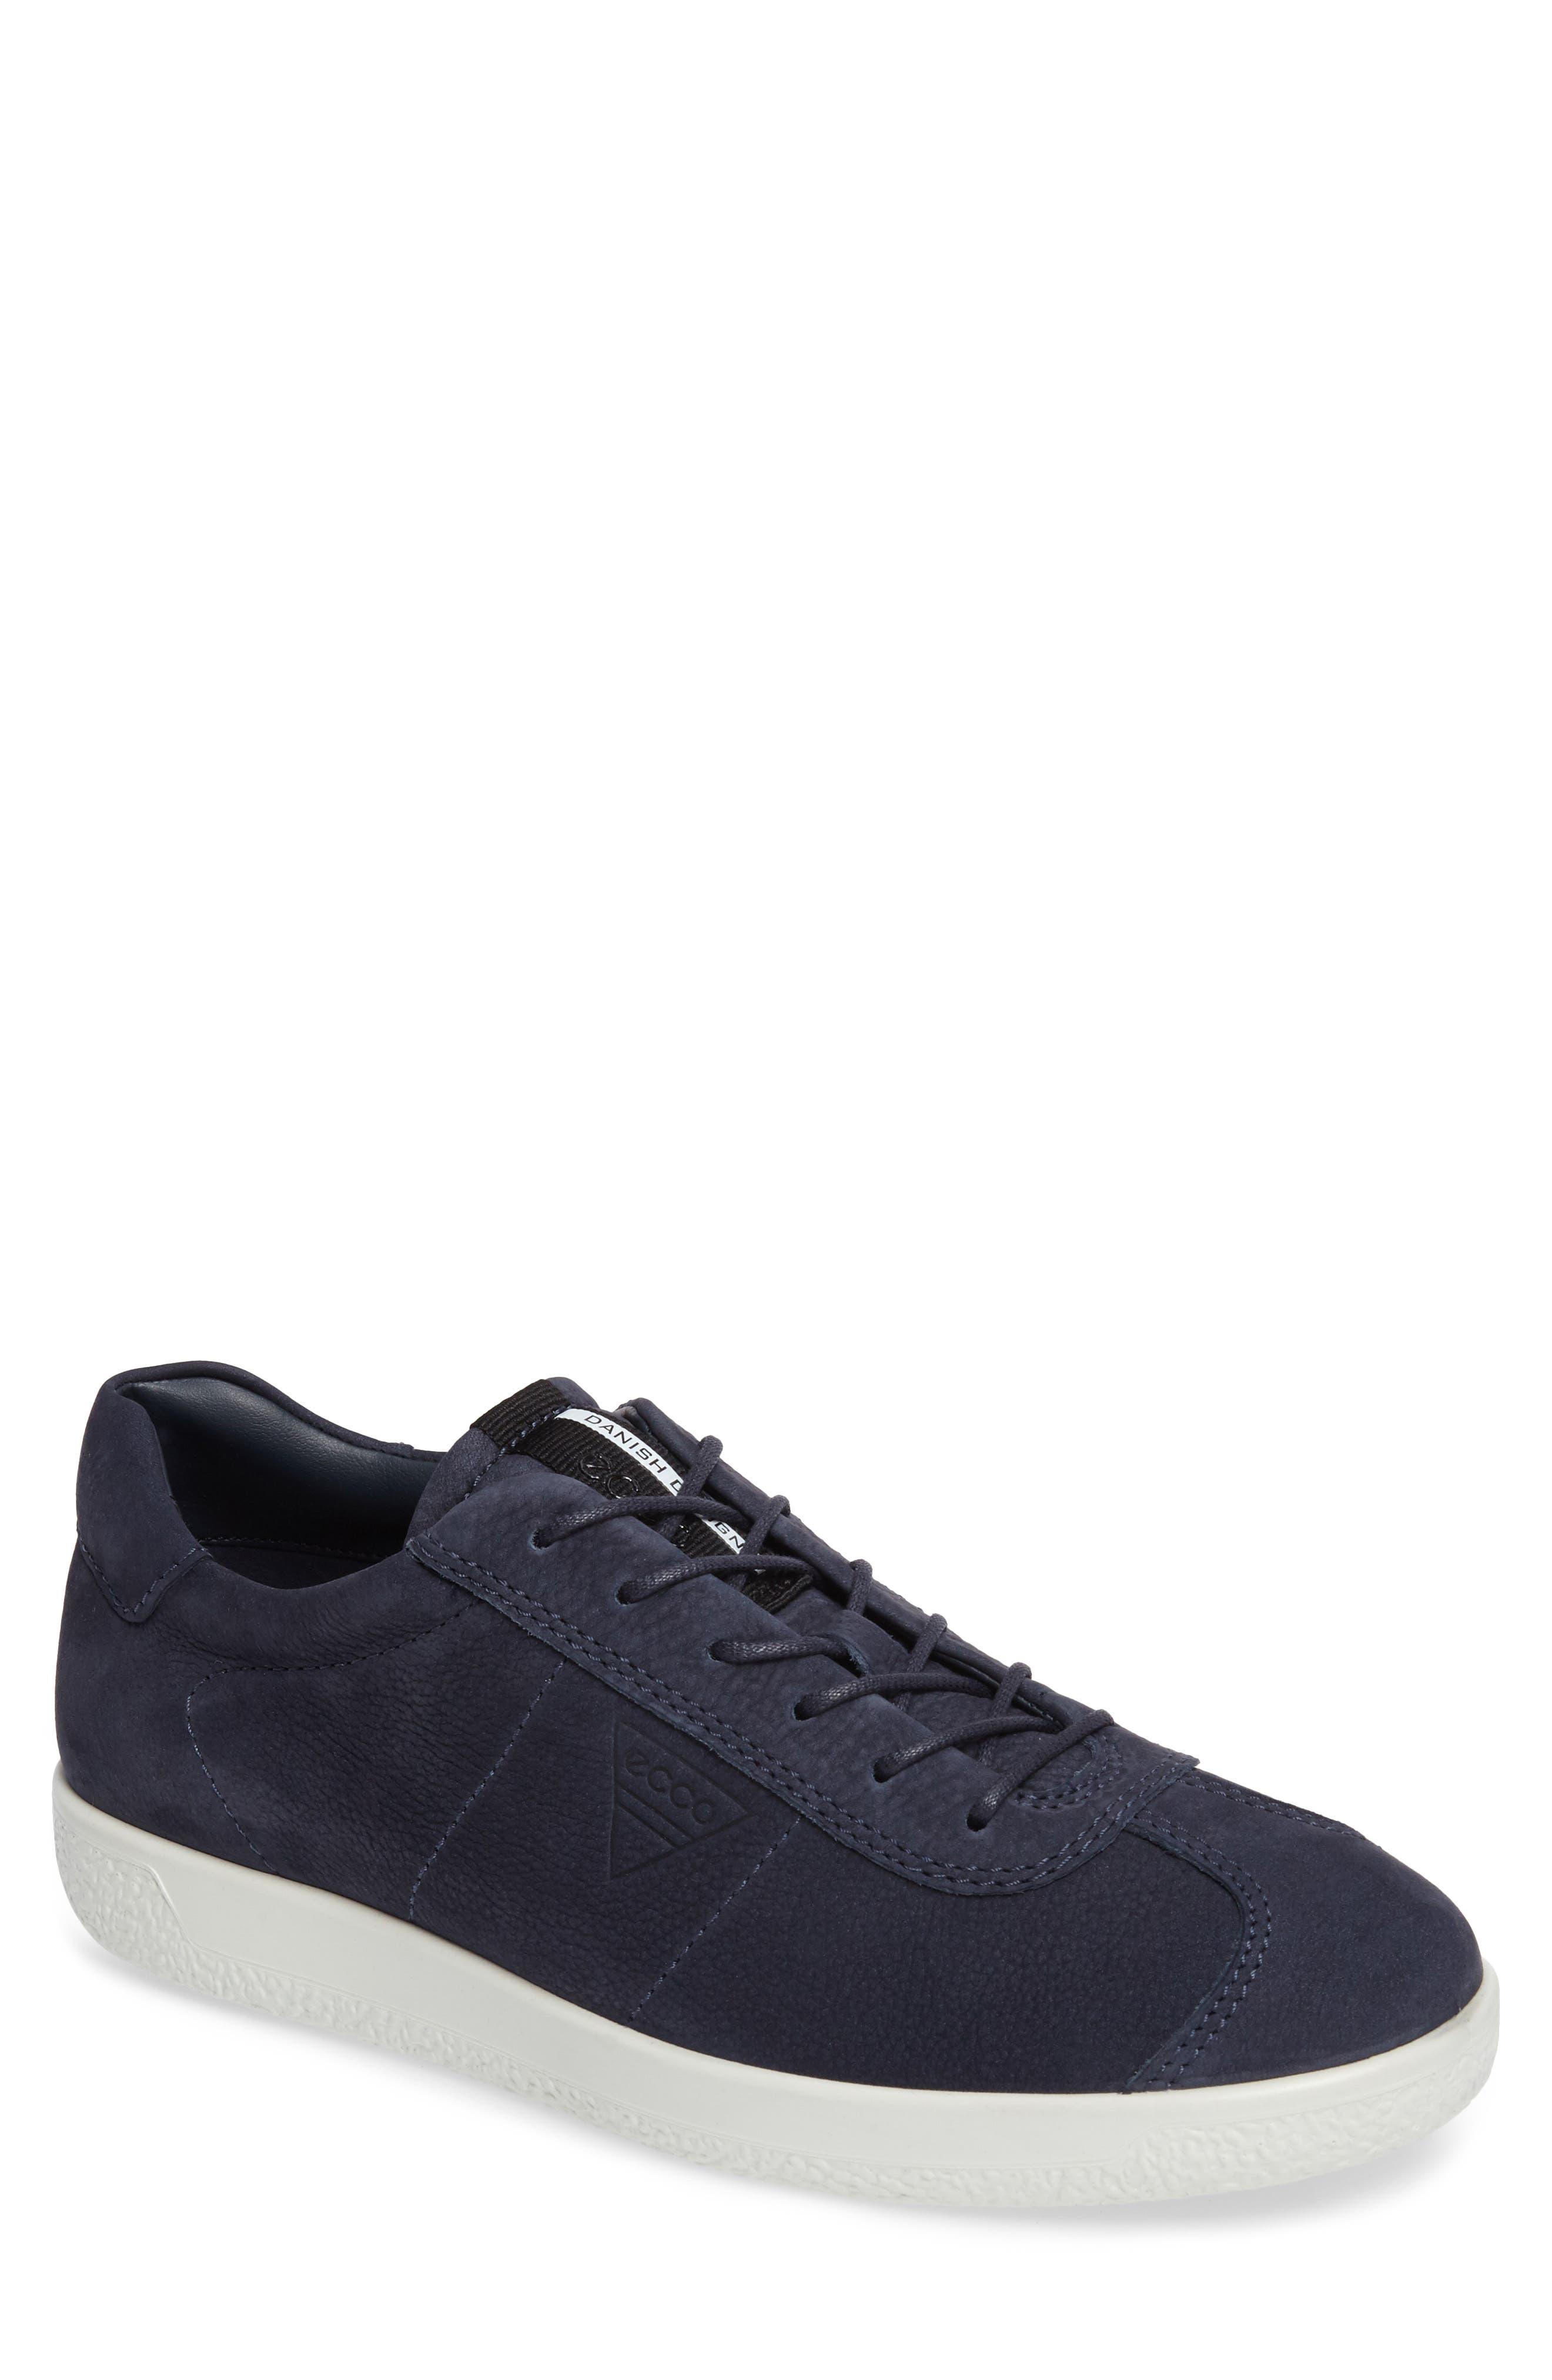 Main Image - ECCO Soft 1 Sneaker (Men)